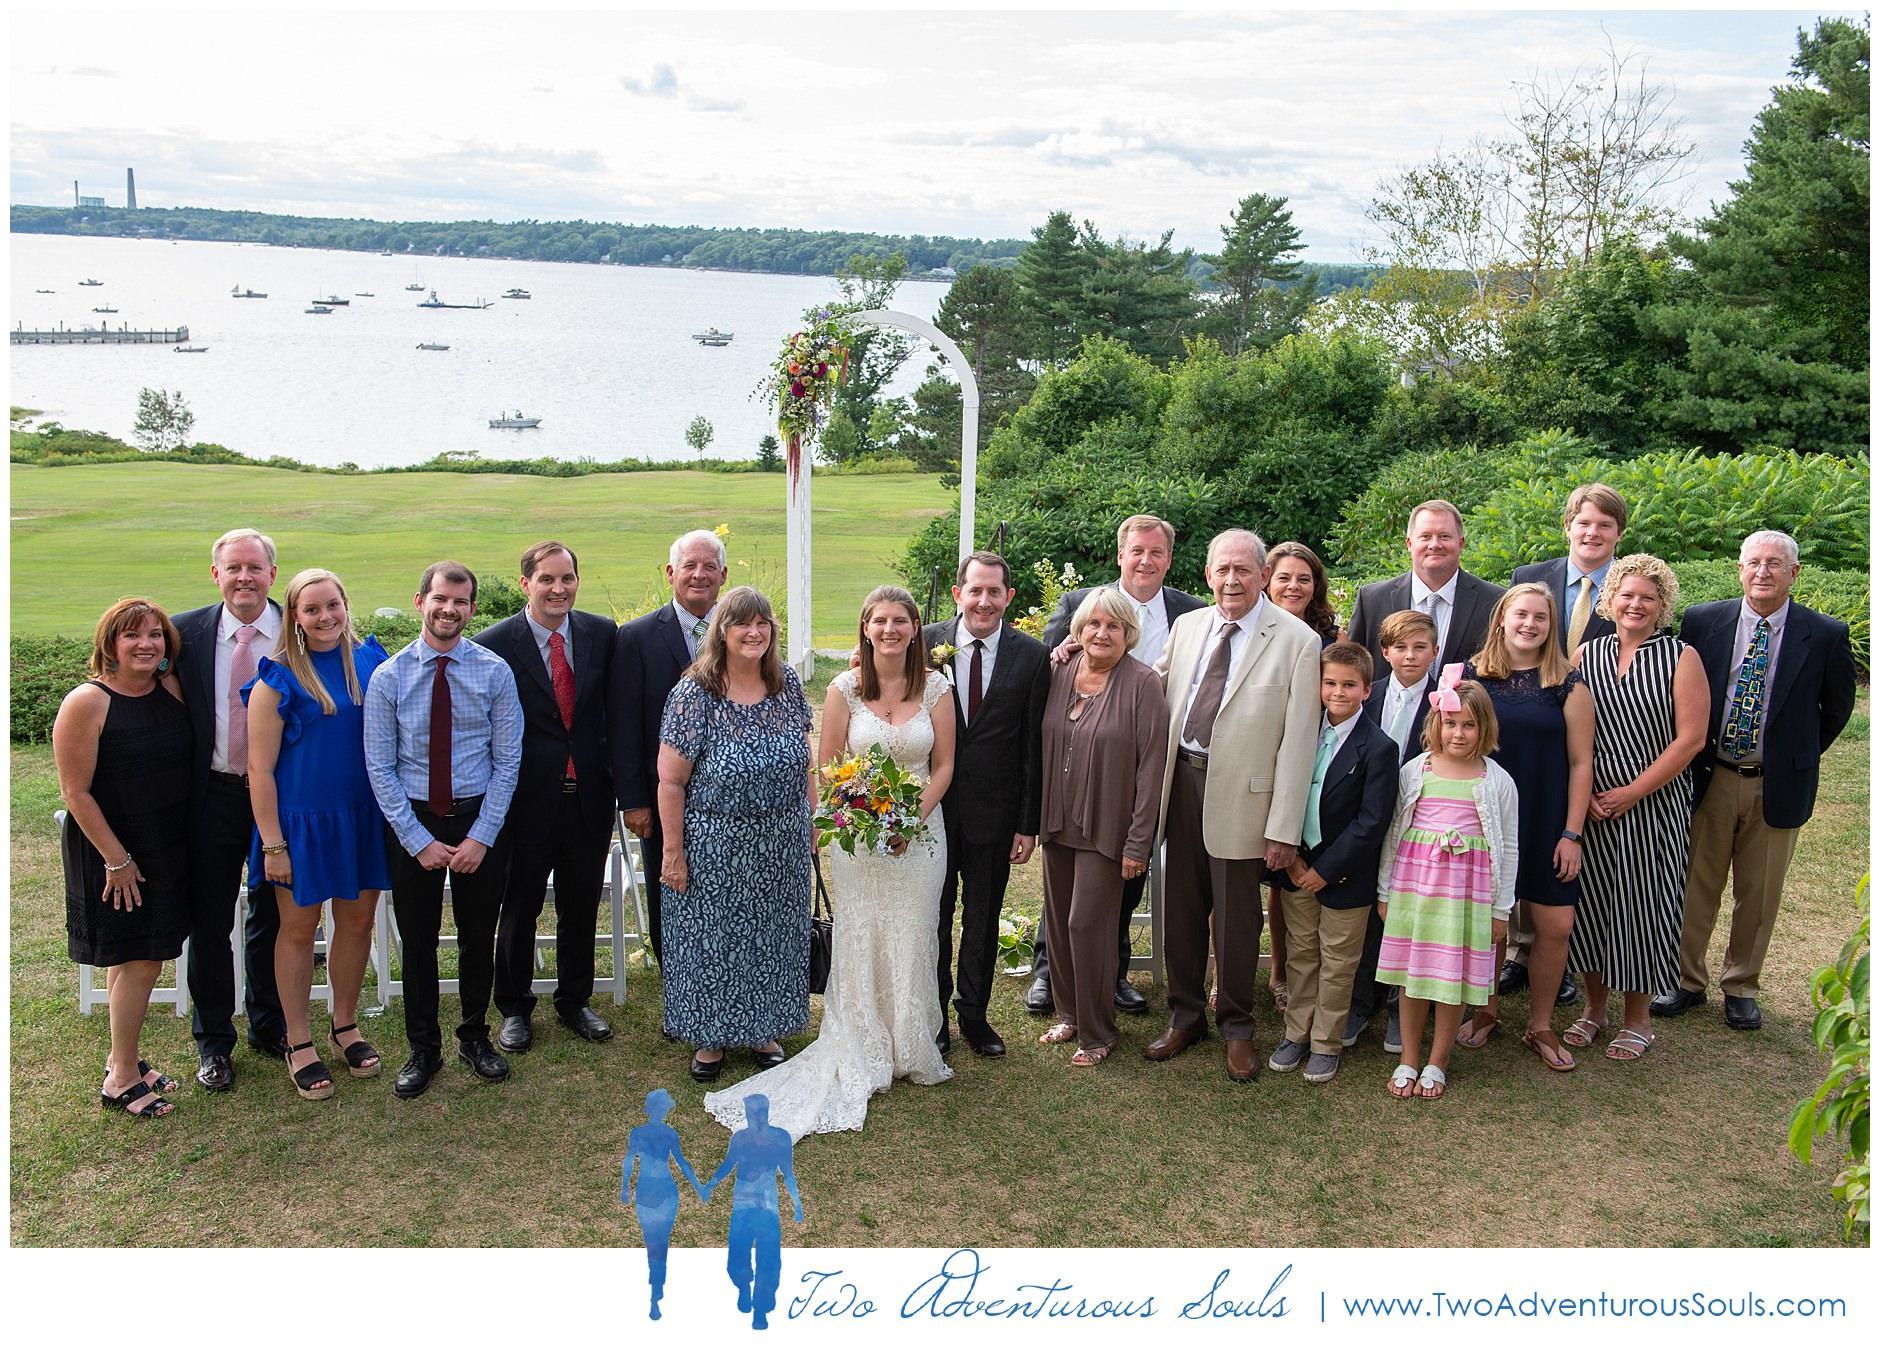 Chebeague Island Inn Wedding Photograpehrs, Maine Wedding Photographers, Two Adventurous Souls-082419_0010.jpg